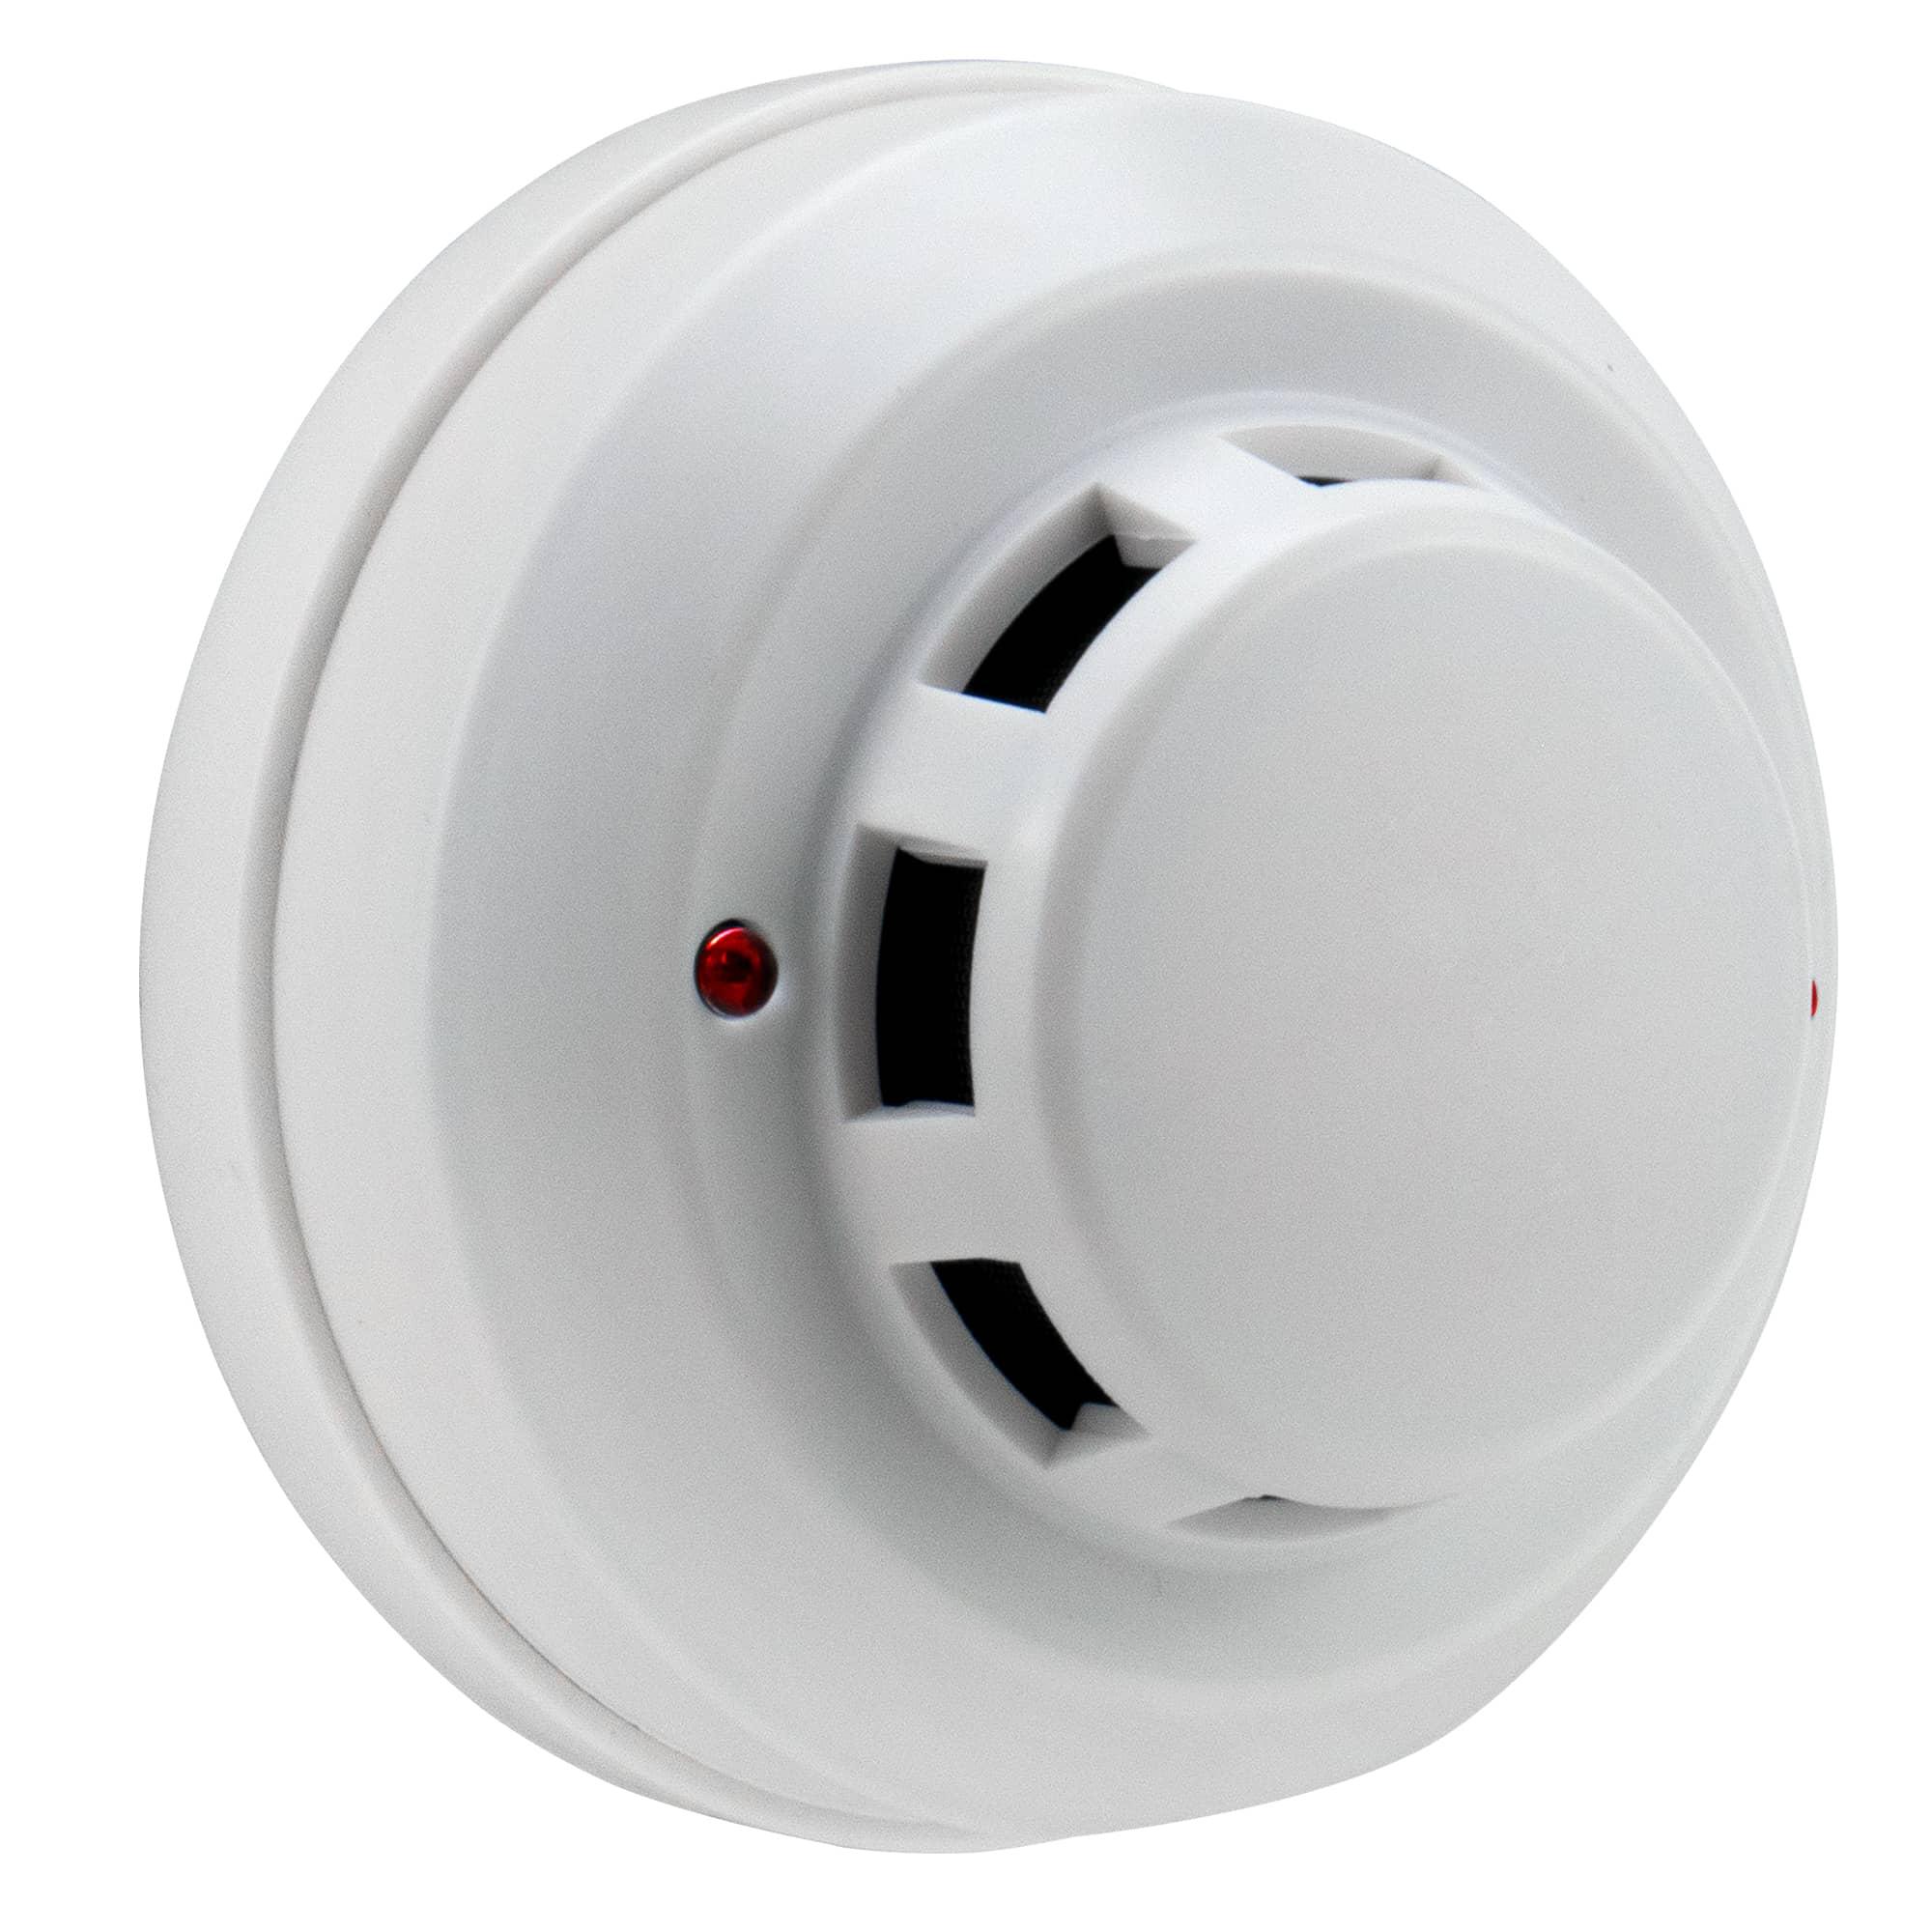 Sensor de humo Gonner Alarms